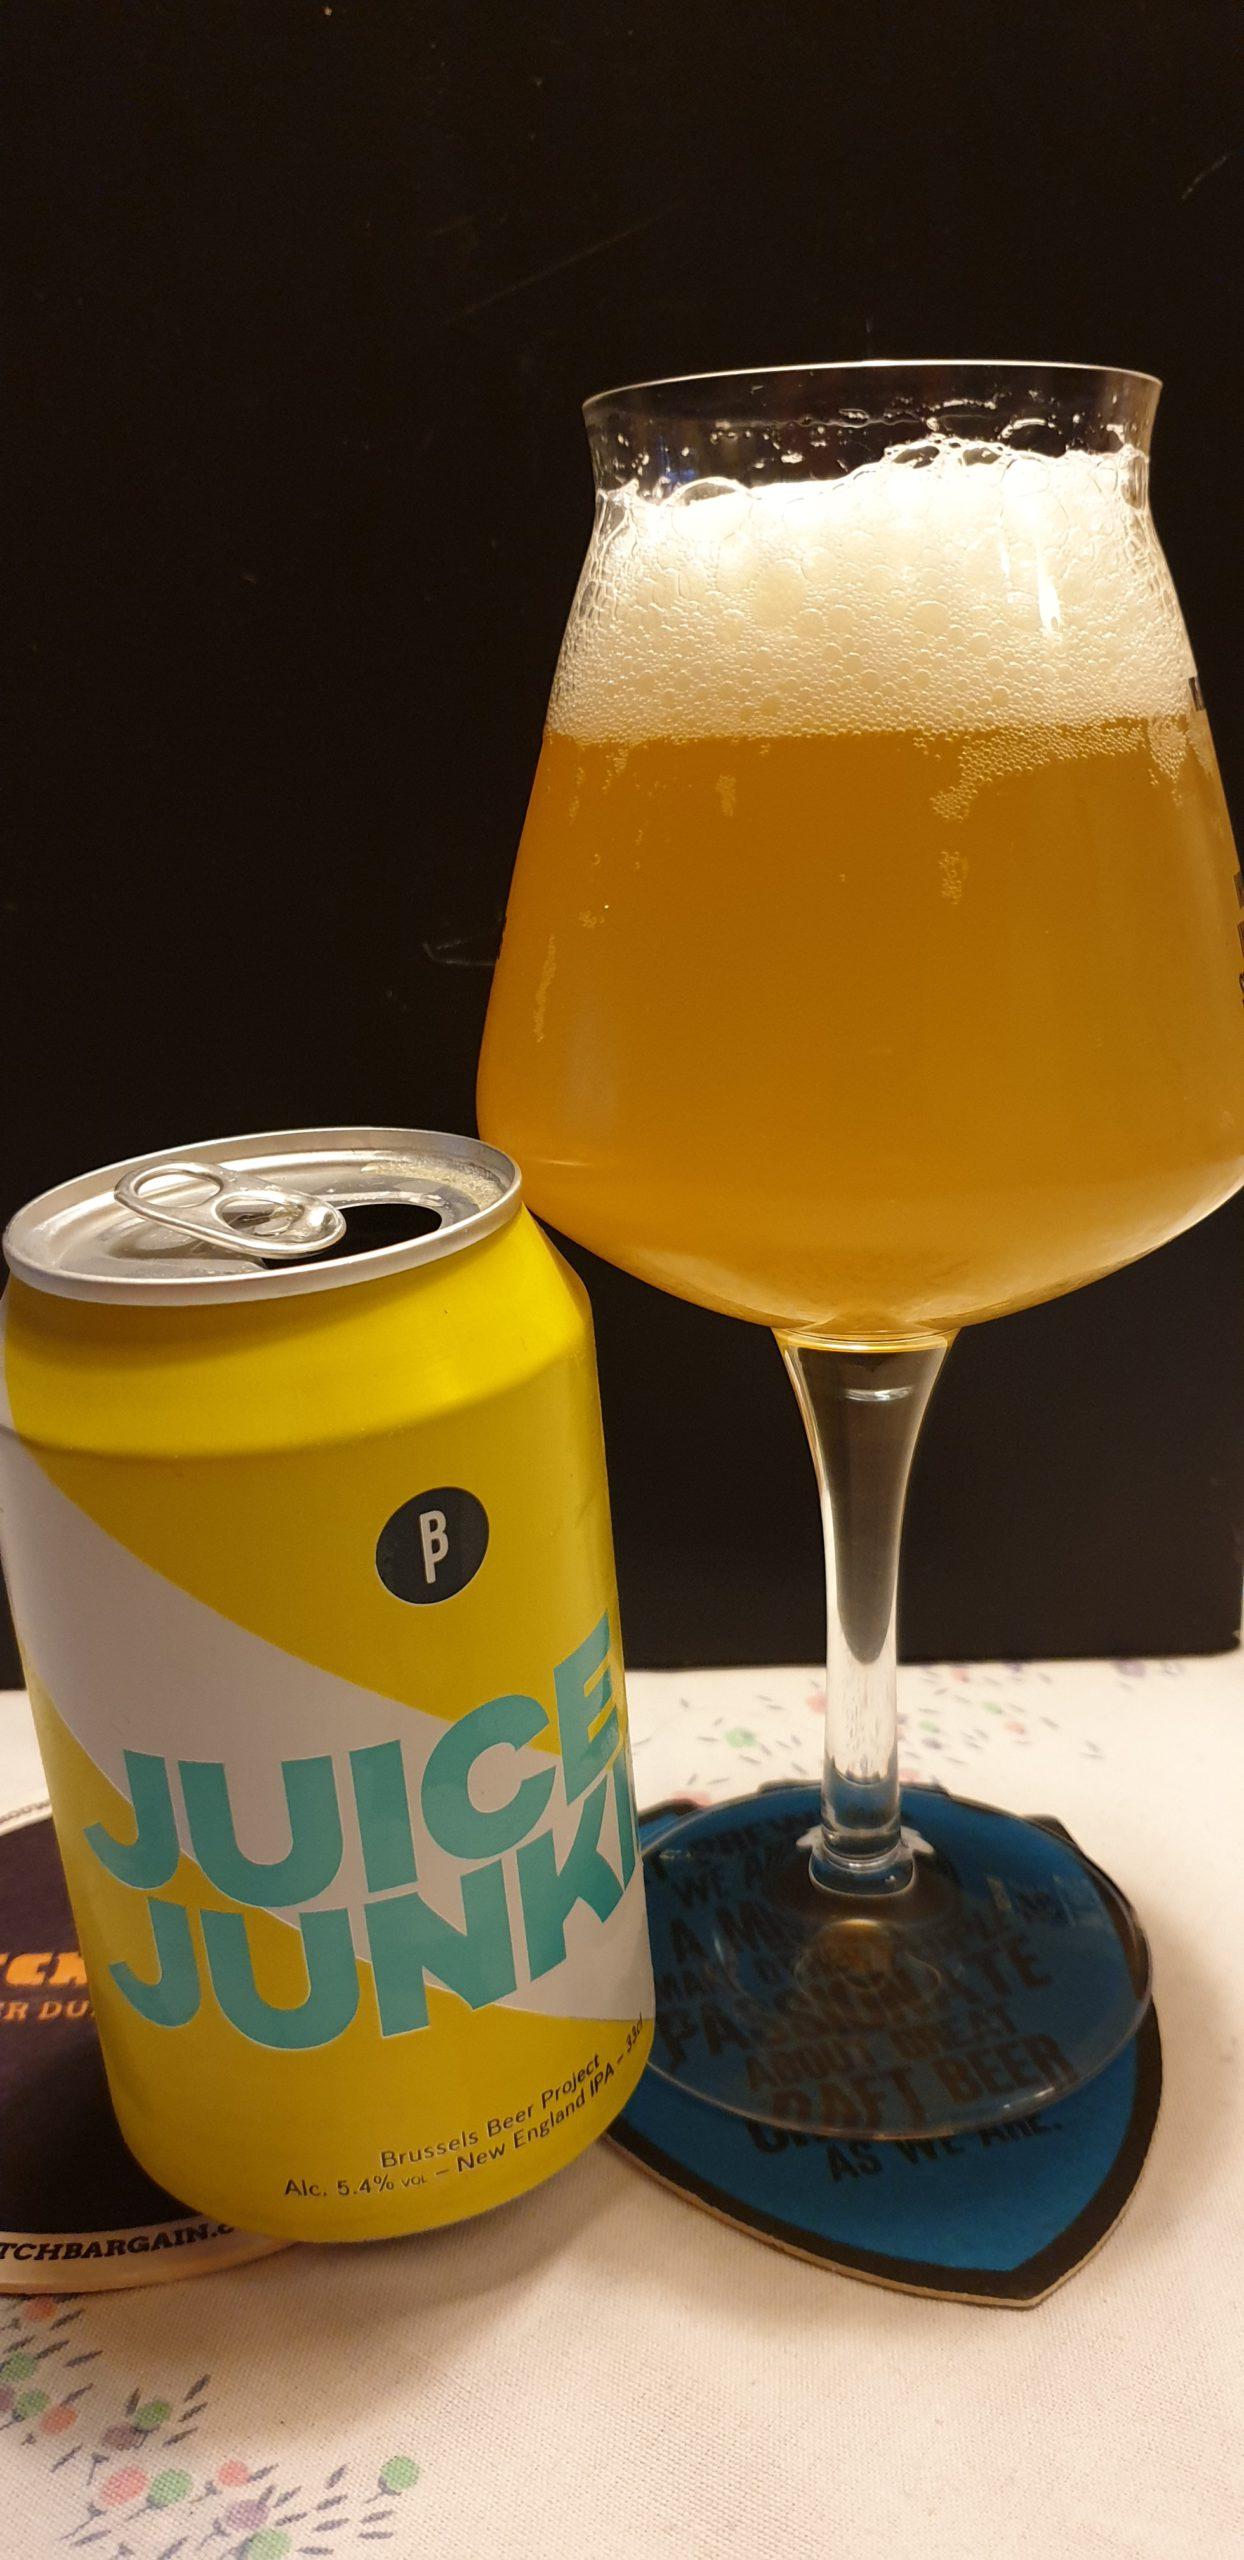 Brussels Beer Project – Juice Junkie